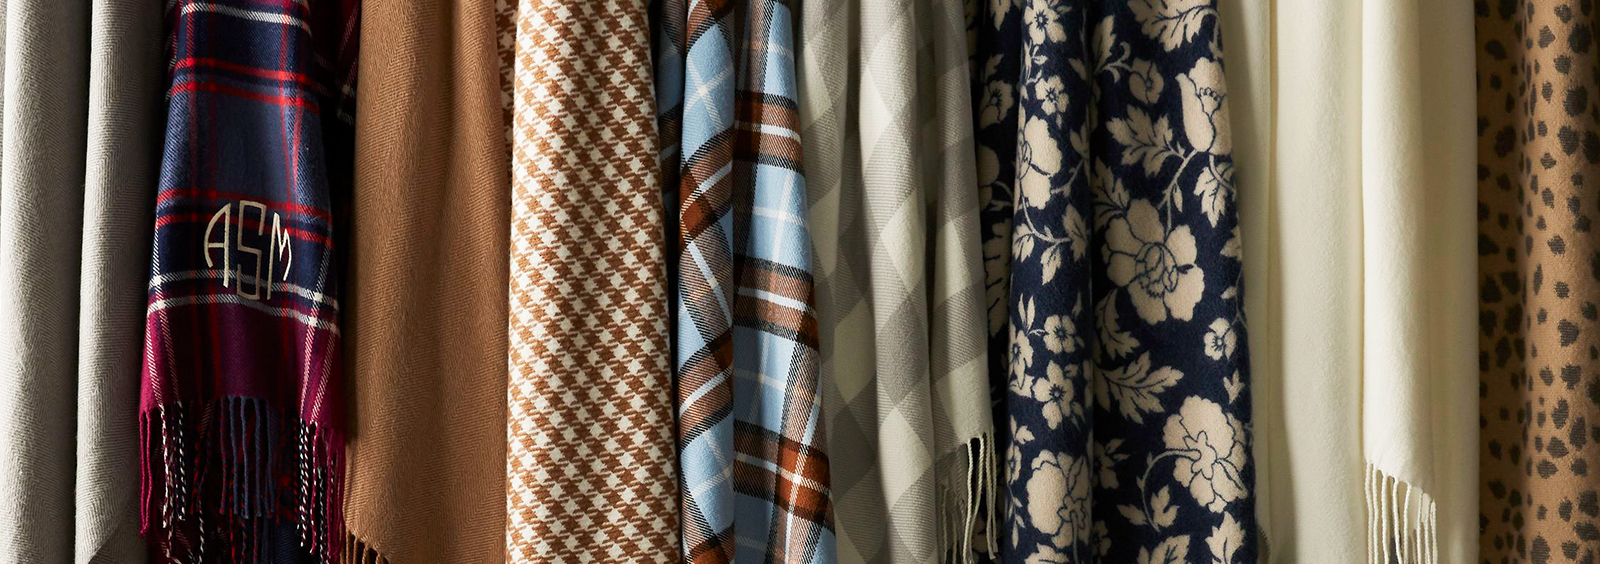 5 Ways to Wear Your Plus Size Pajamas